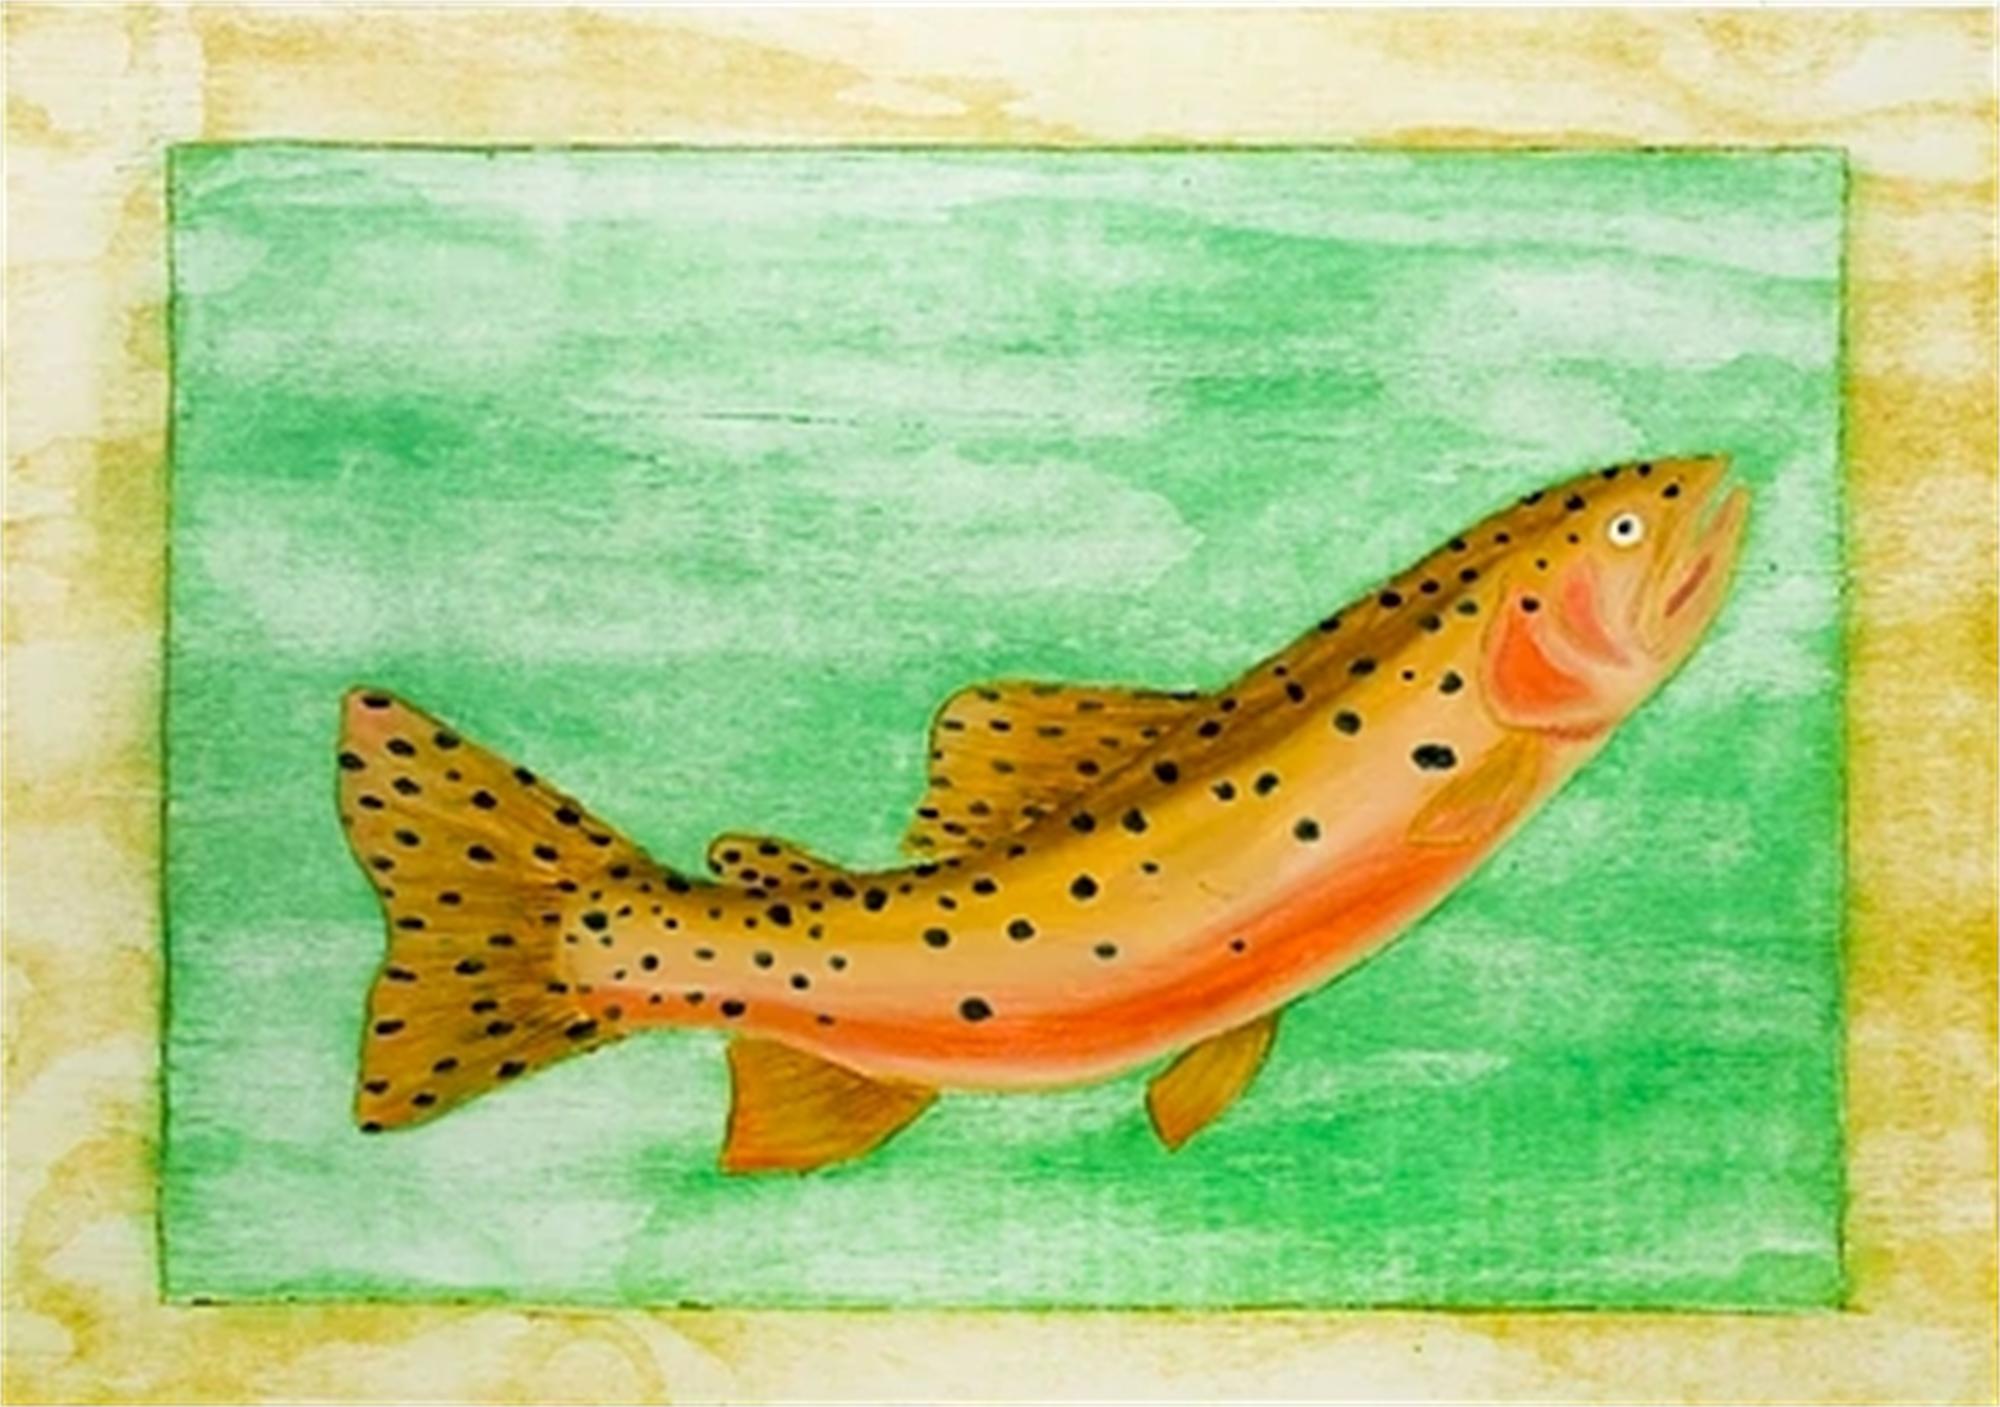 Cutthroat Trout by David Hefner